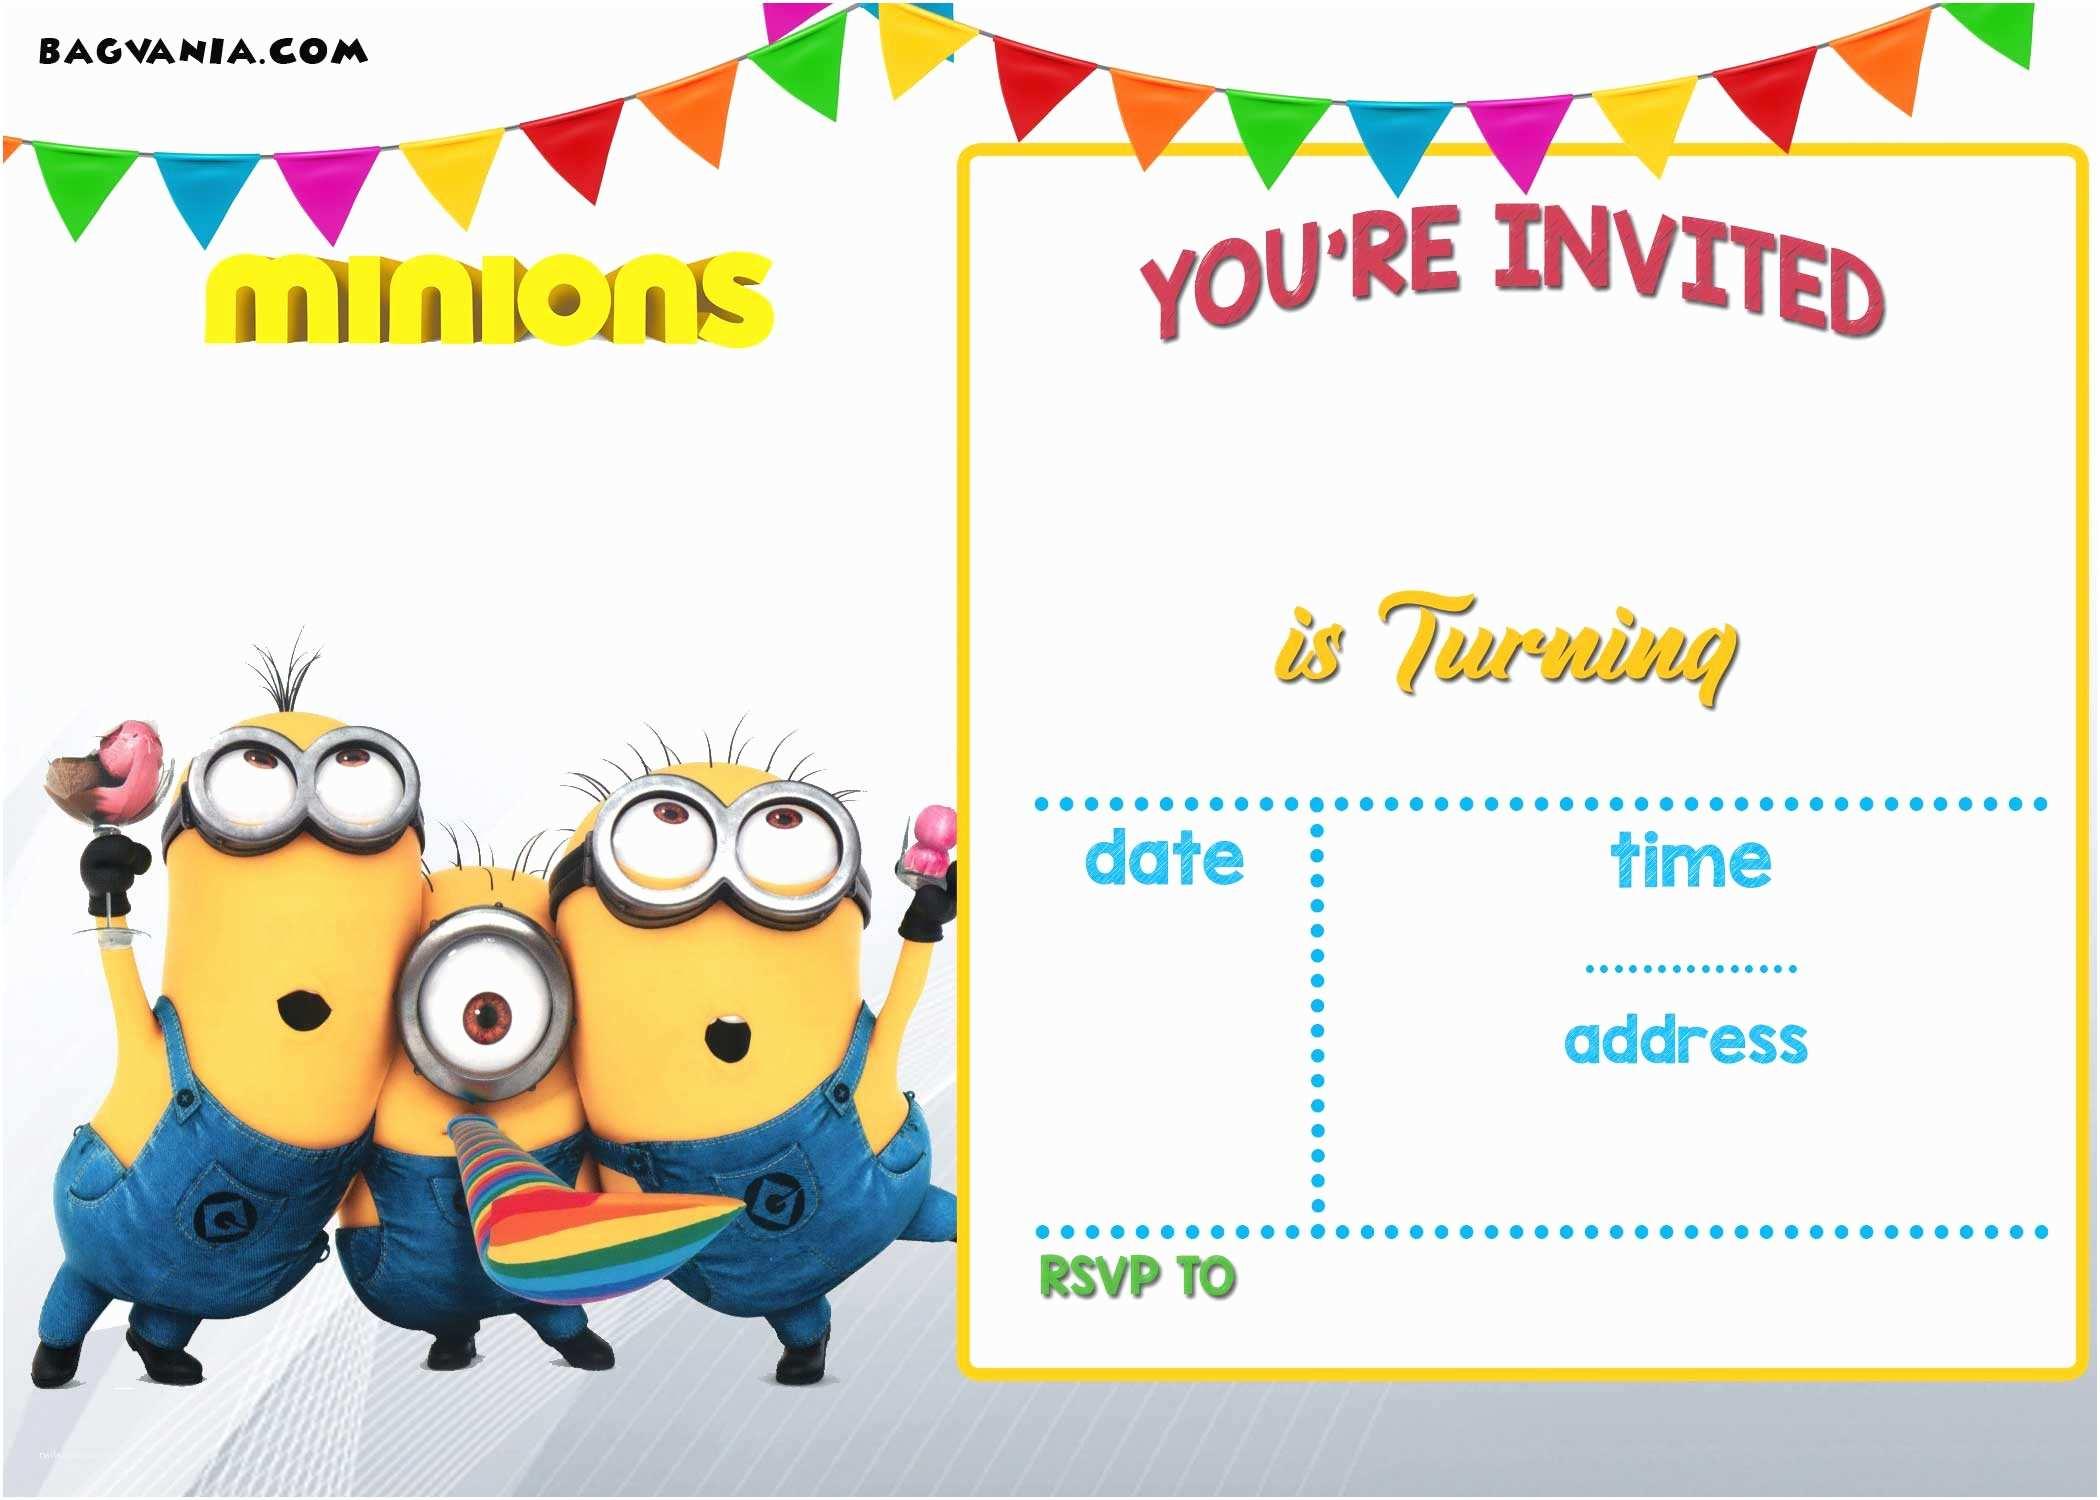 Minions Birthday Invitations Free Printable Minion Birthday Party Invitations Ideas